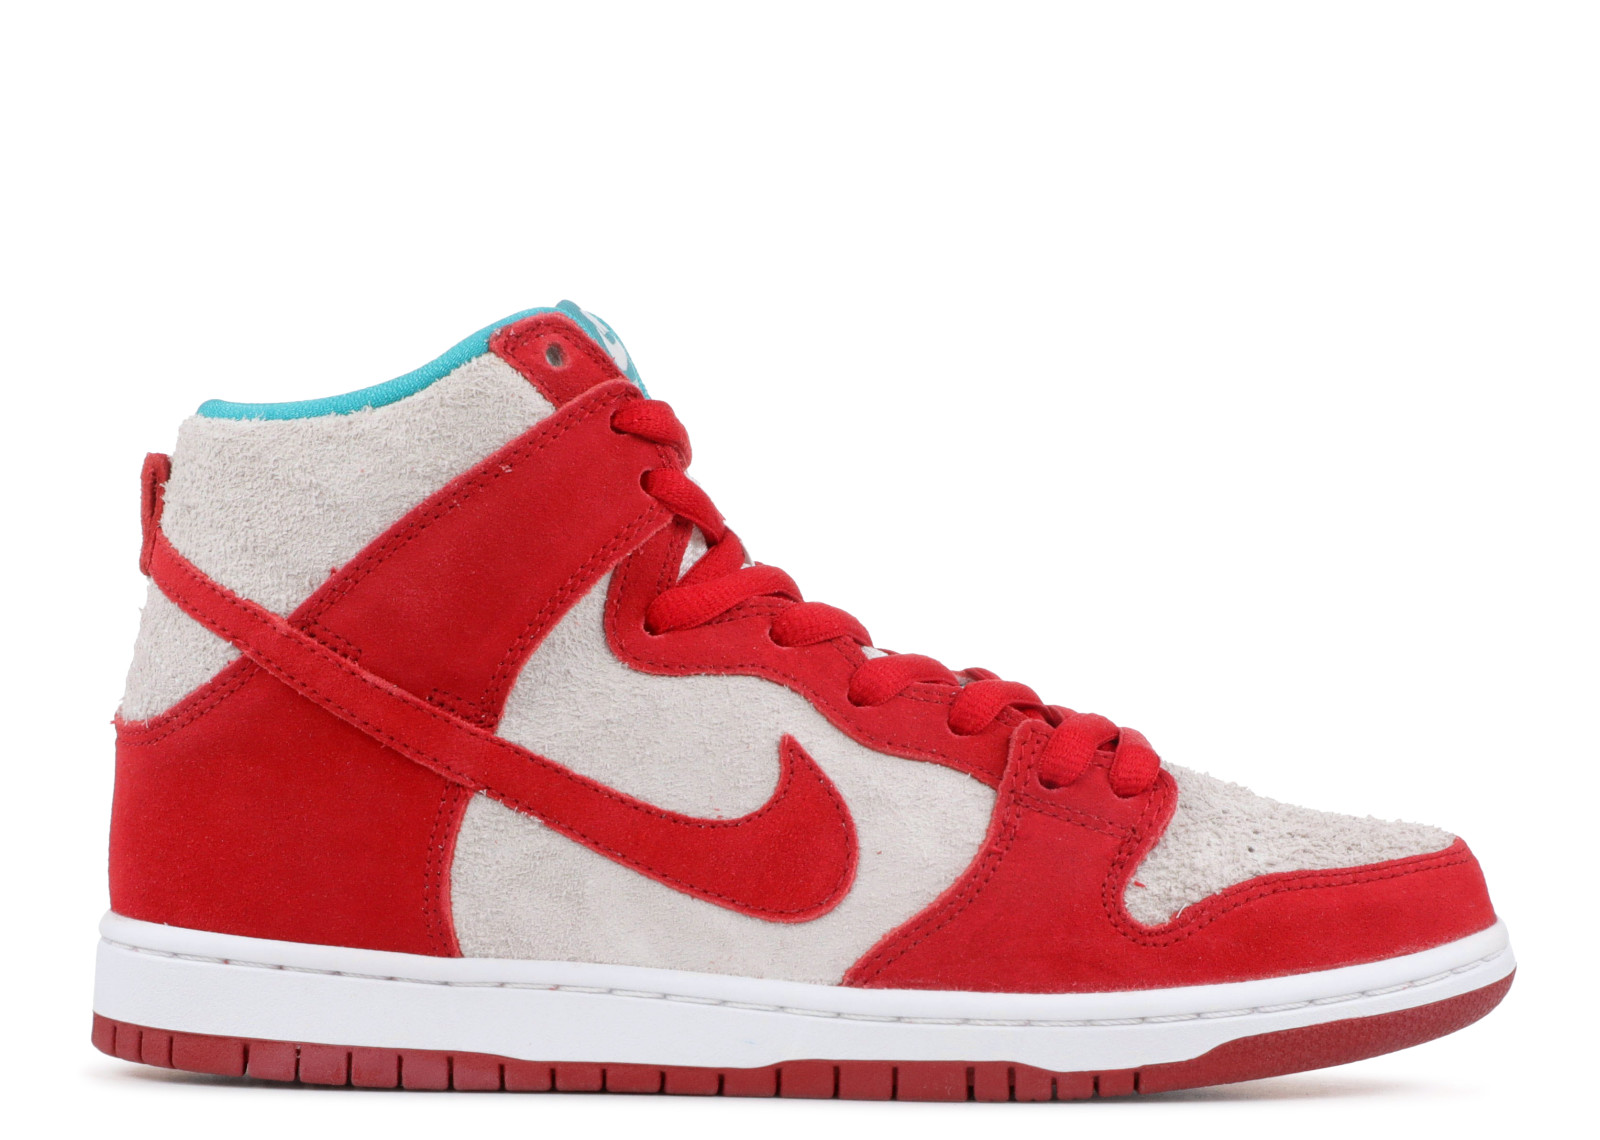 competitive price 5a5d6 c9177 Nike - Men - Dunk High Pro Sb 'Dr. Seuss' - 305050-661 - Size 10